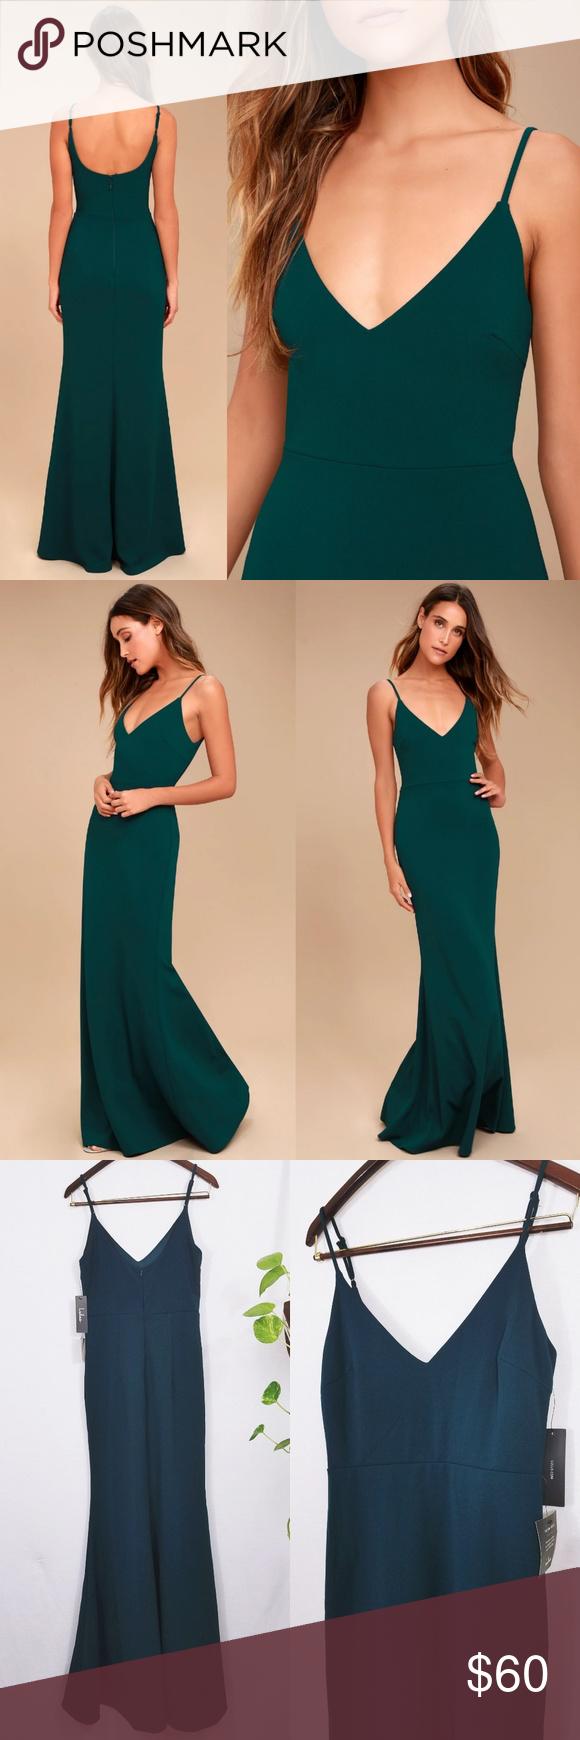 249e80ff3b Infinite Glory Forest Green Maxi Lulus Dress Sleek